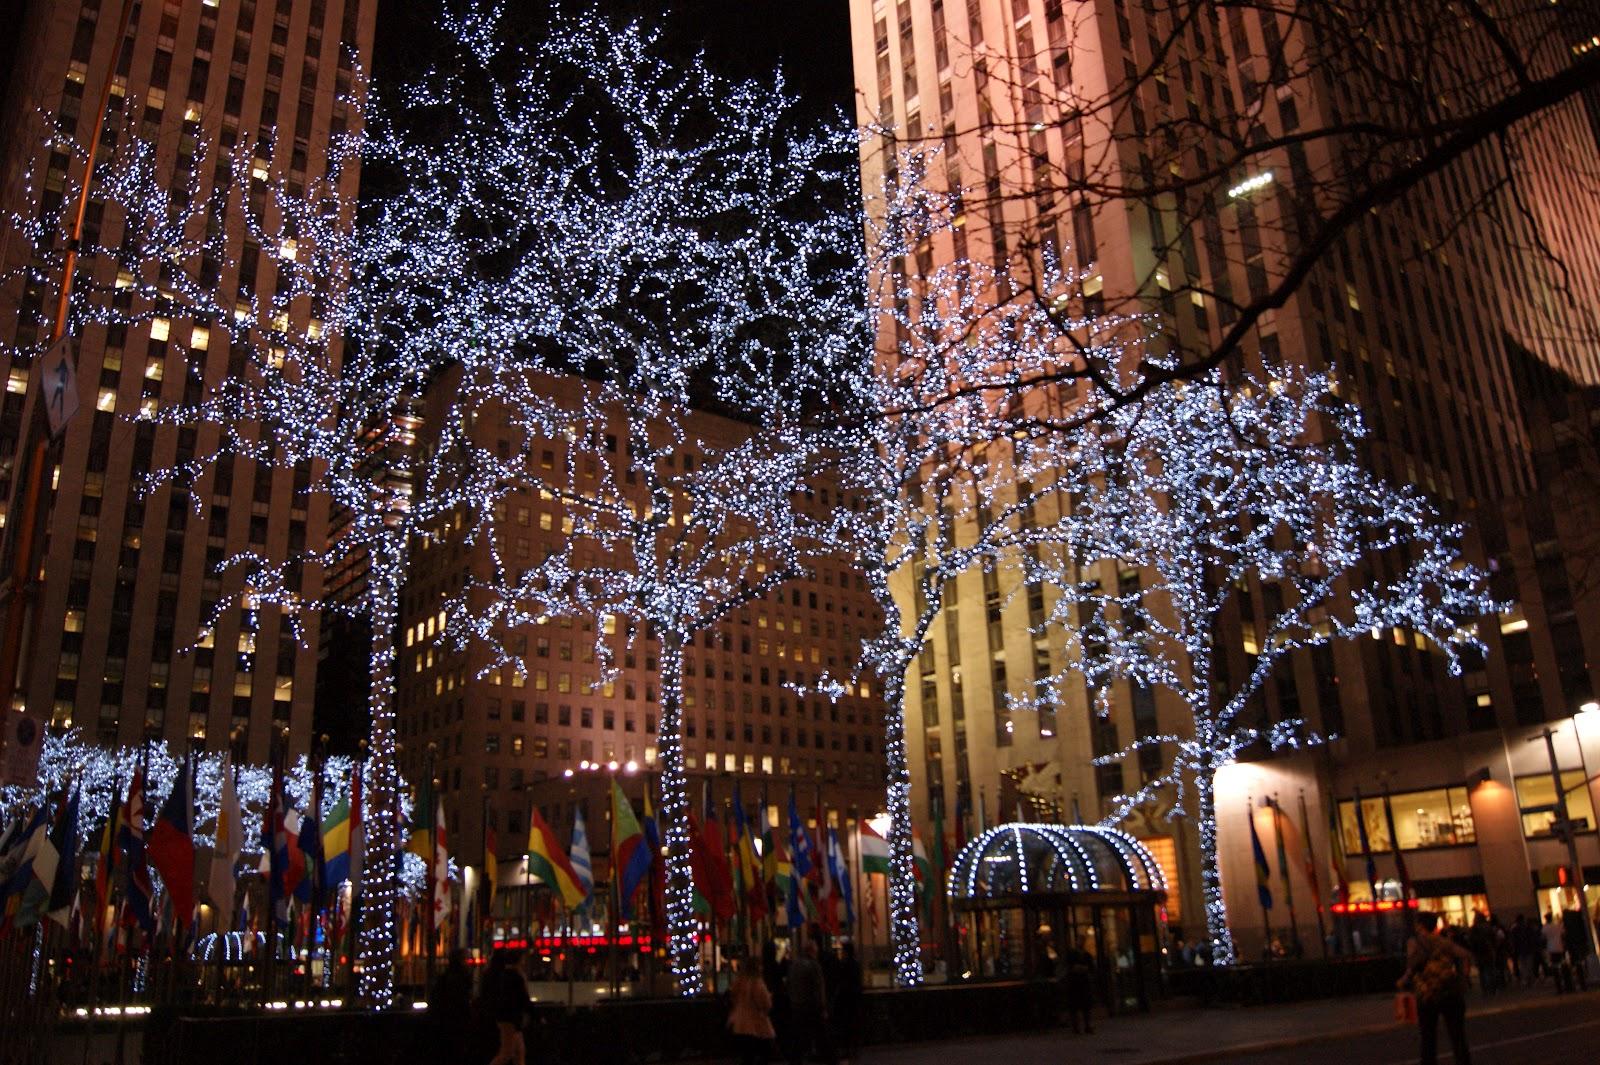 UNITED STATES CHRISTMAS SEASON « World of Kathy Kiefer